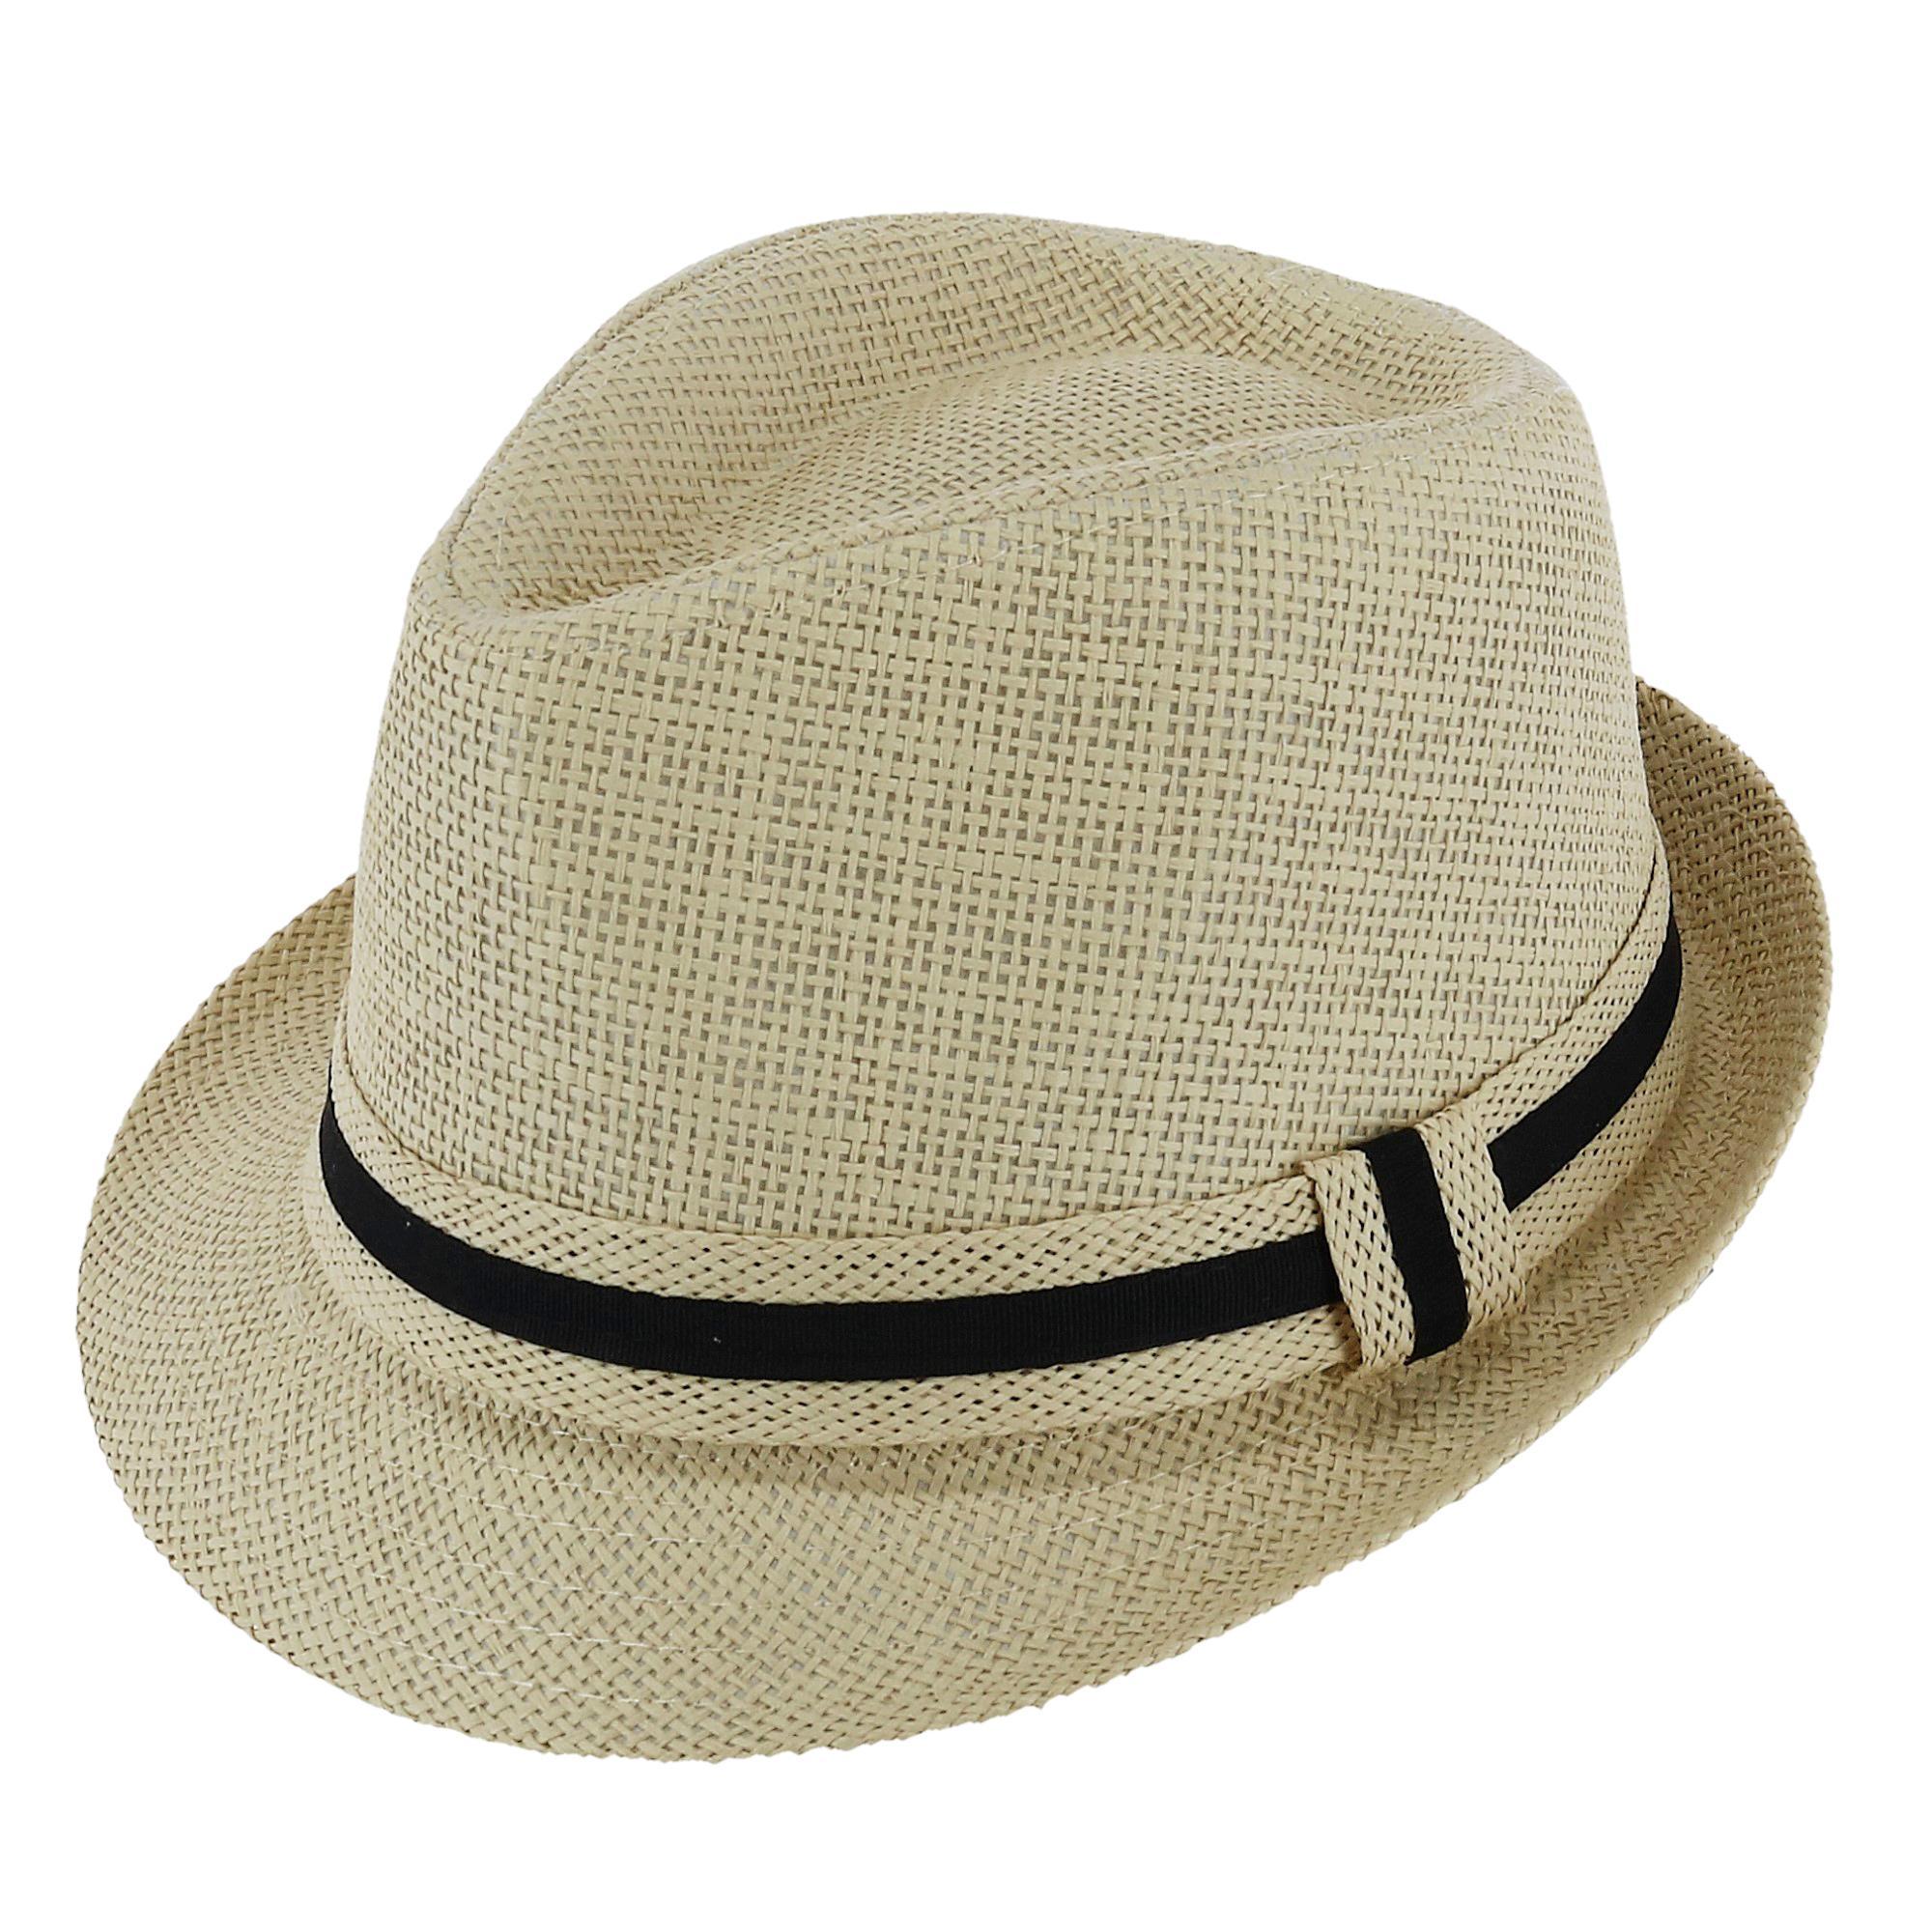 225ba29c79c17 Details about New Westend Men's Short Brim Banded Fedora Hat